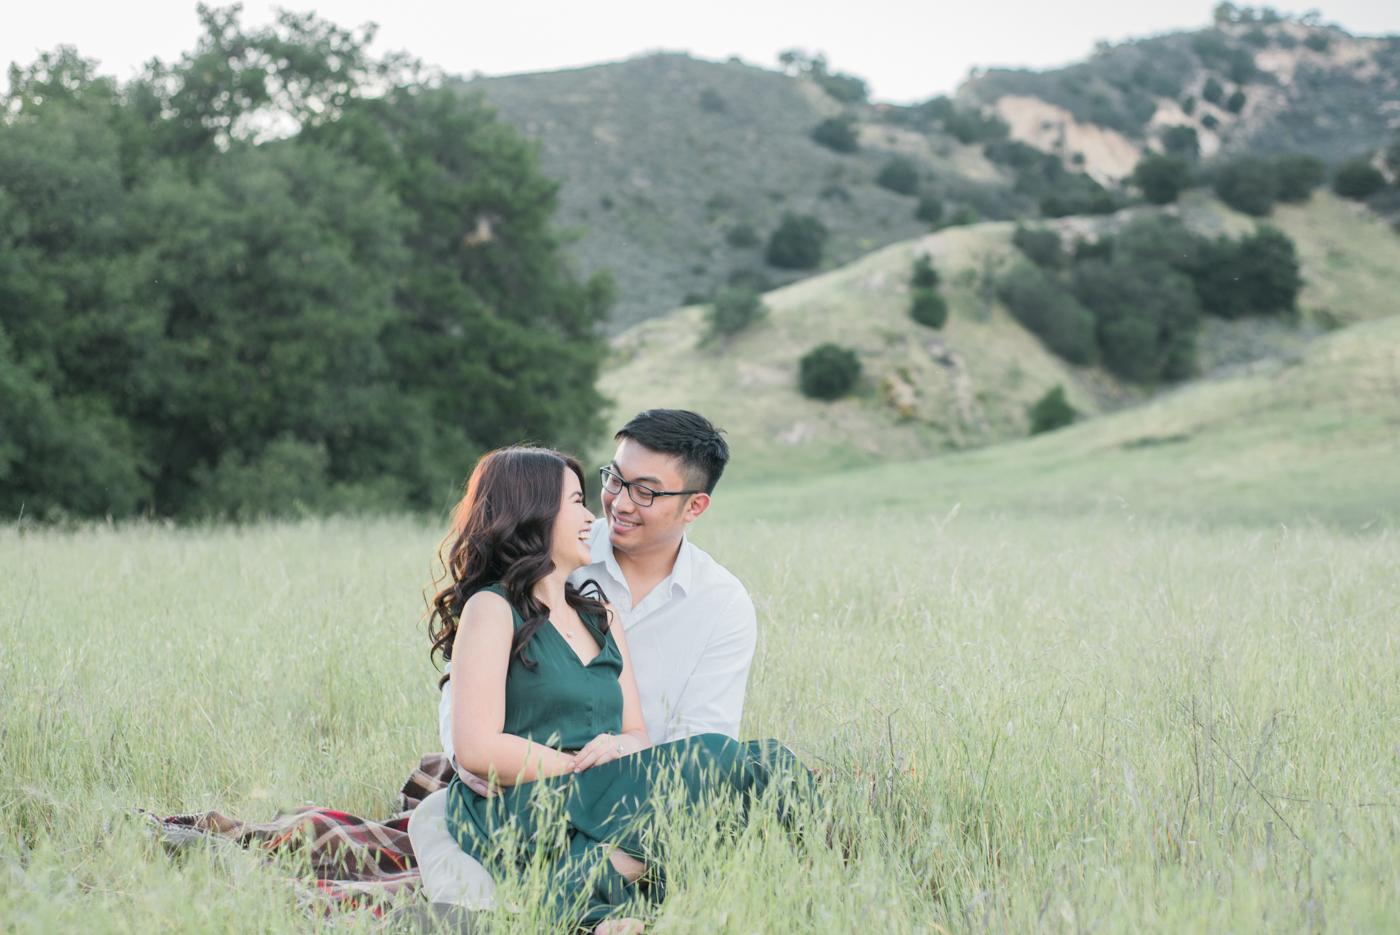 dianne&christian-malibu-creek-state-park-engagement-session-photography-los-angeles-based-wedding-photographer-3.jpg